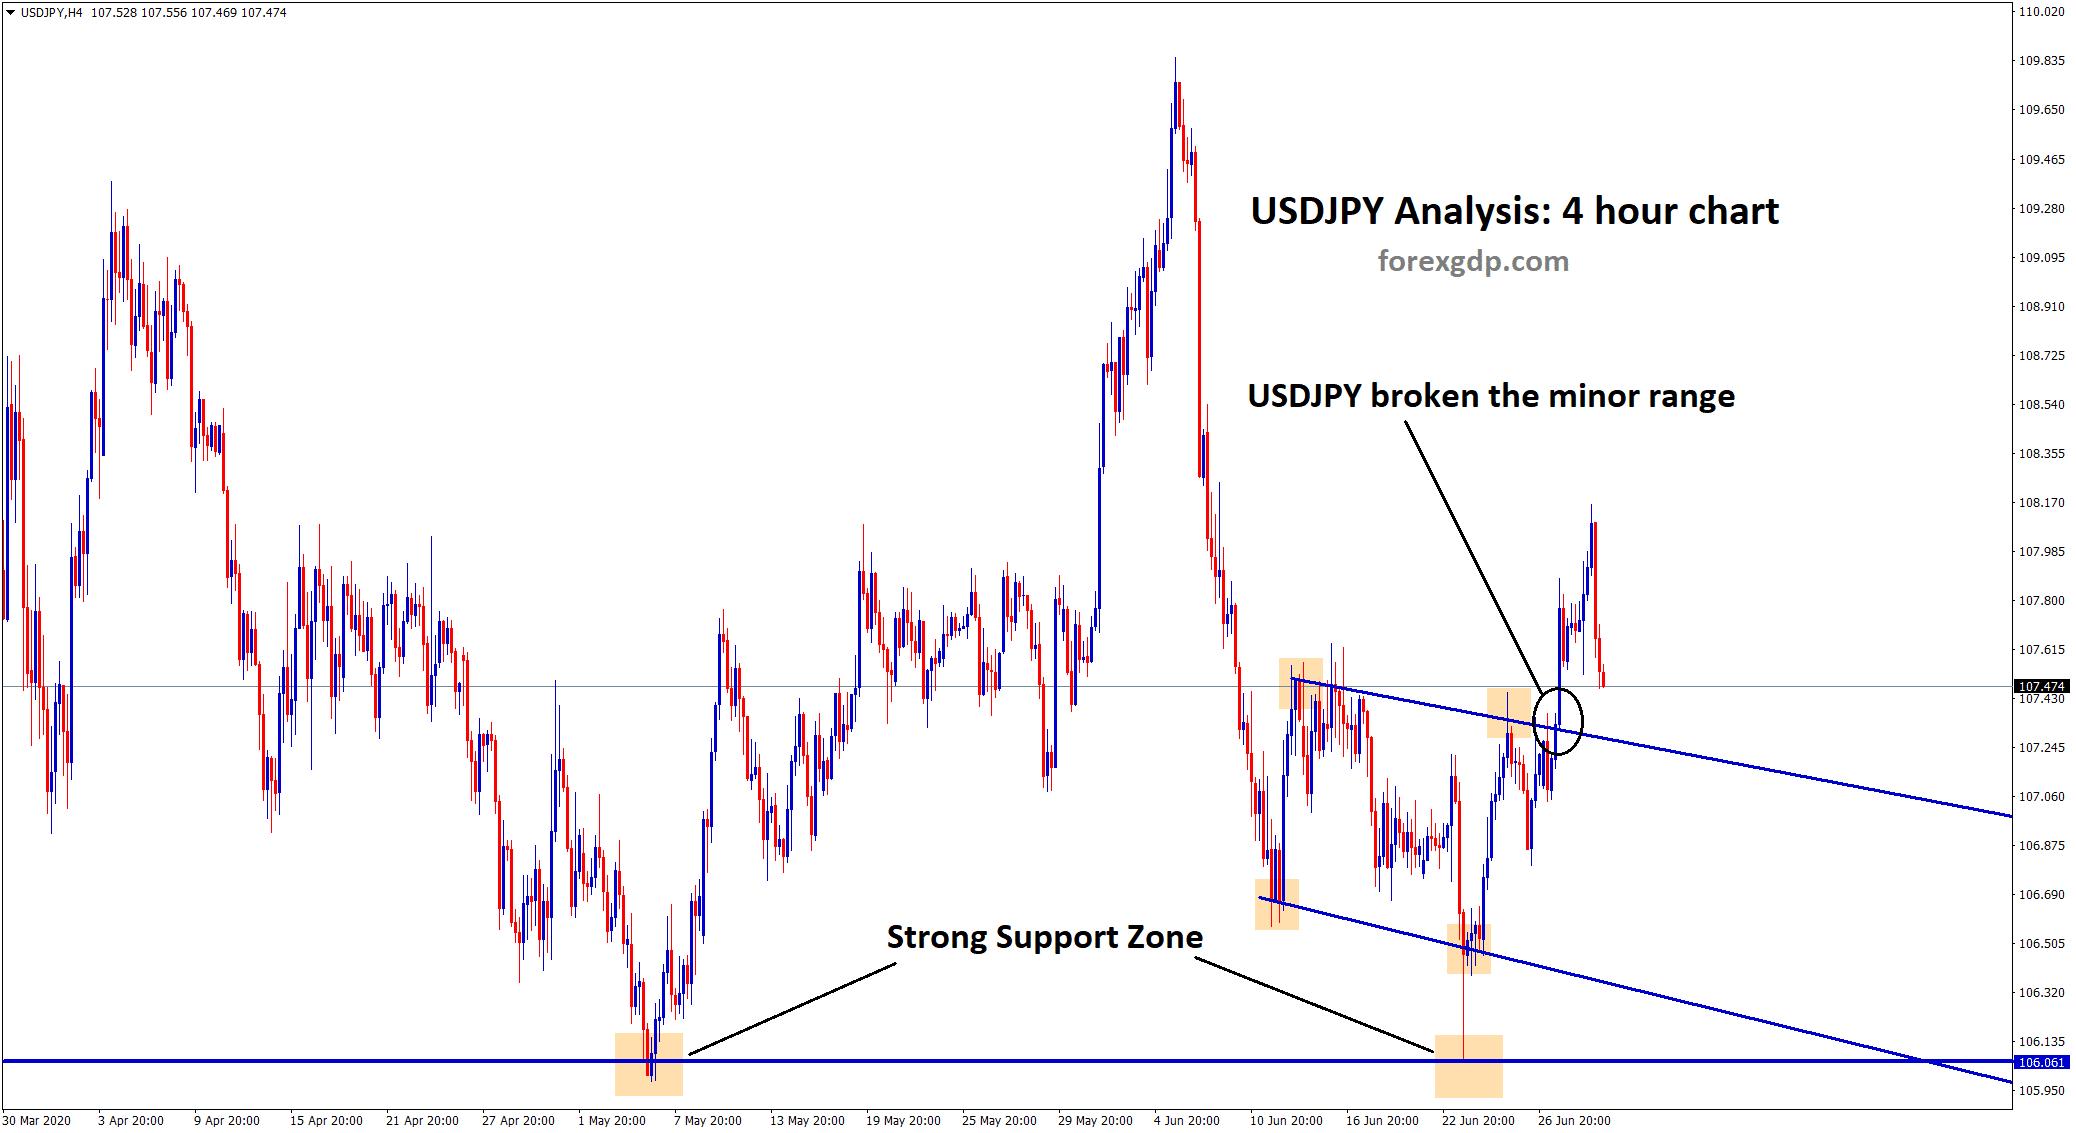 USDJPY broken minor range after bouncing from support